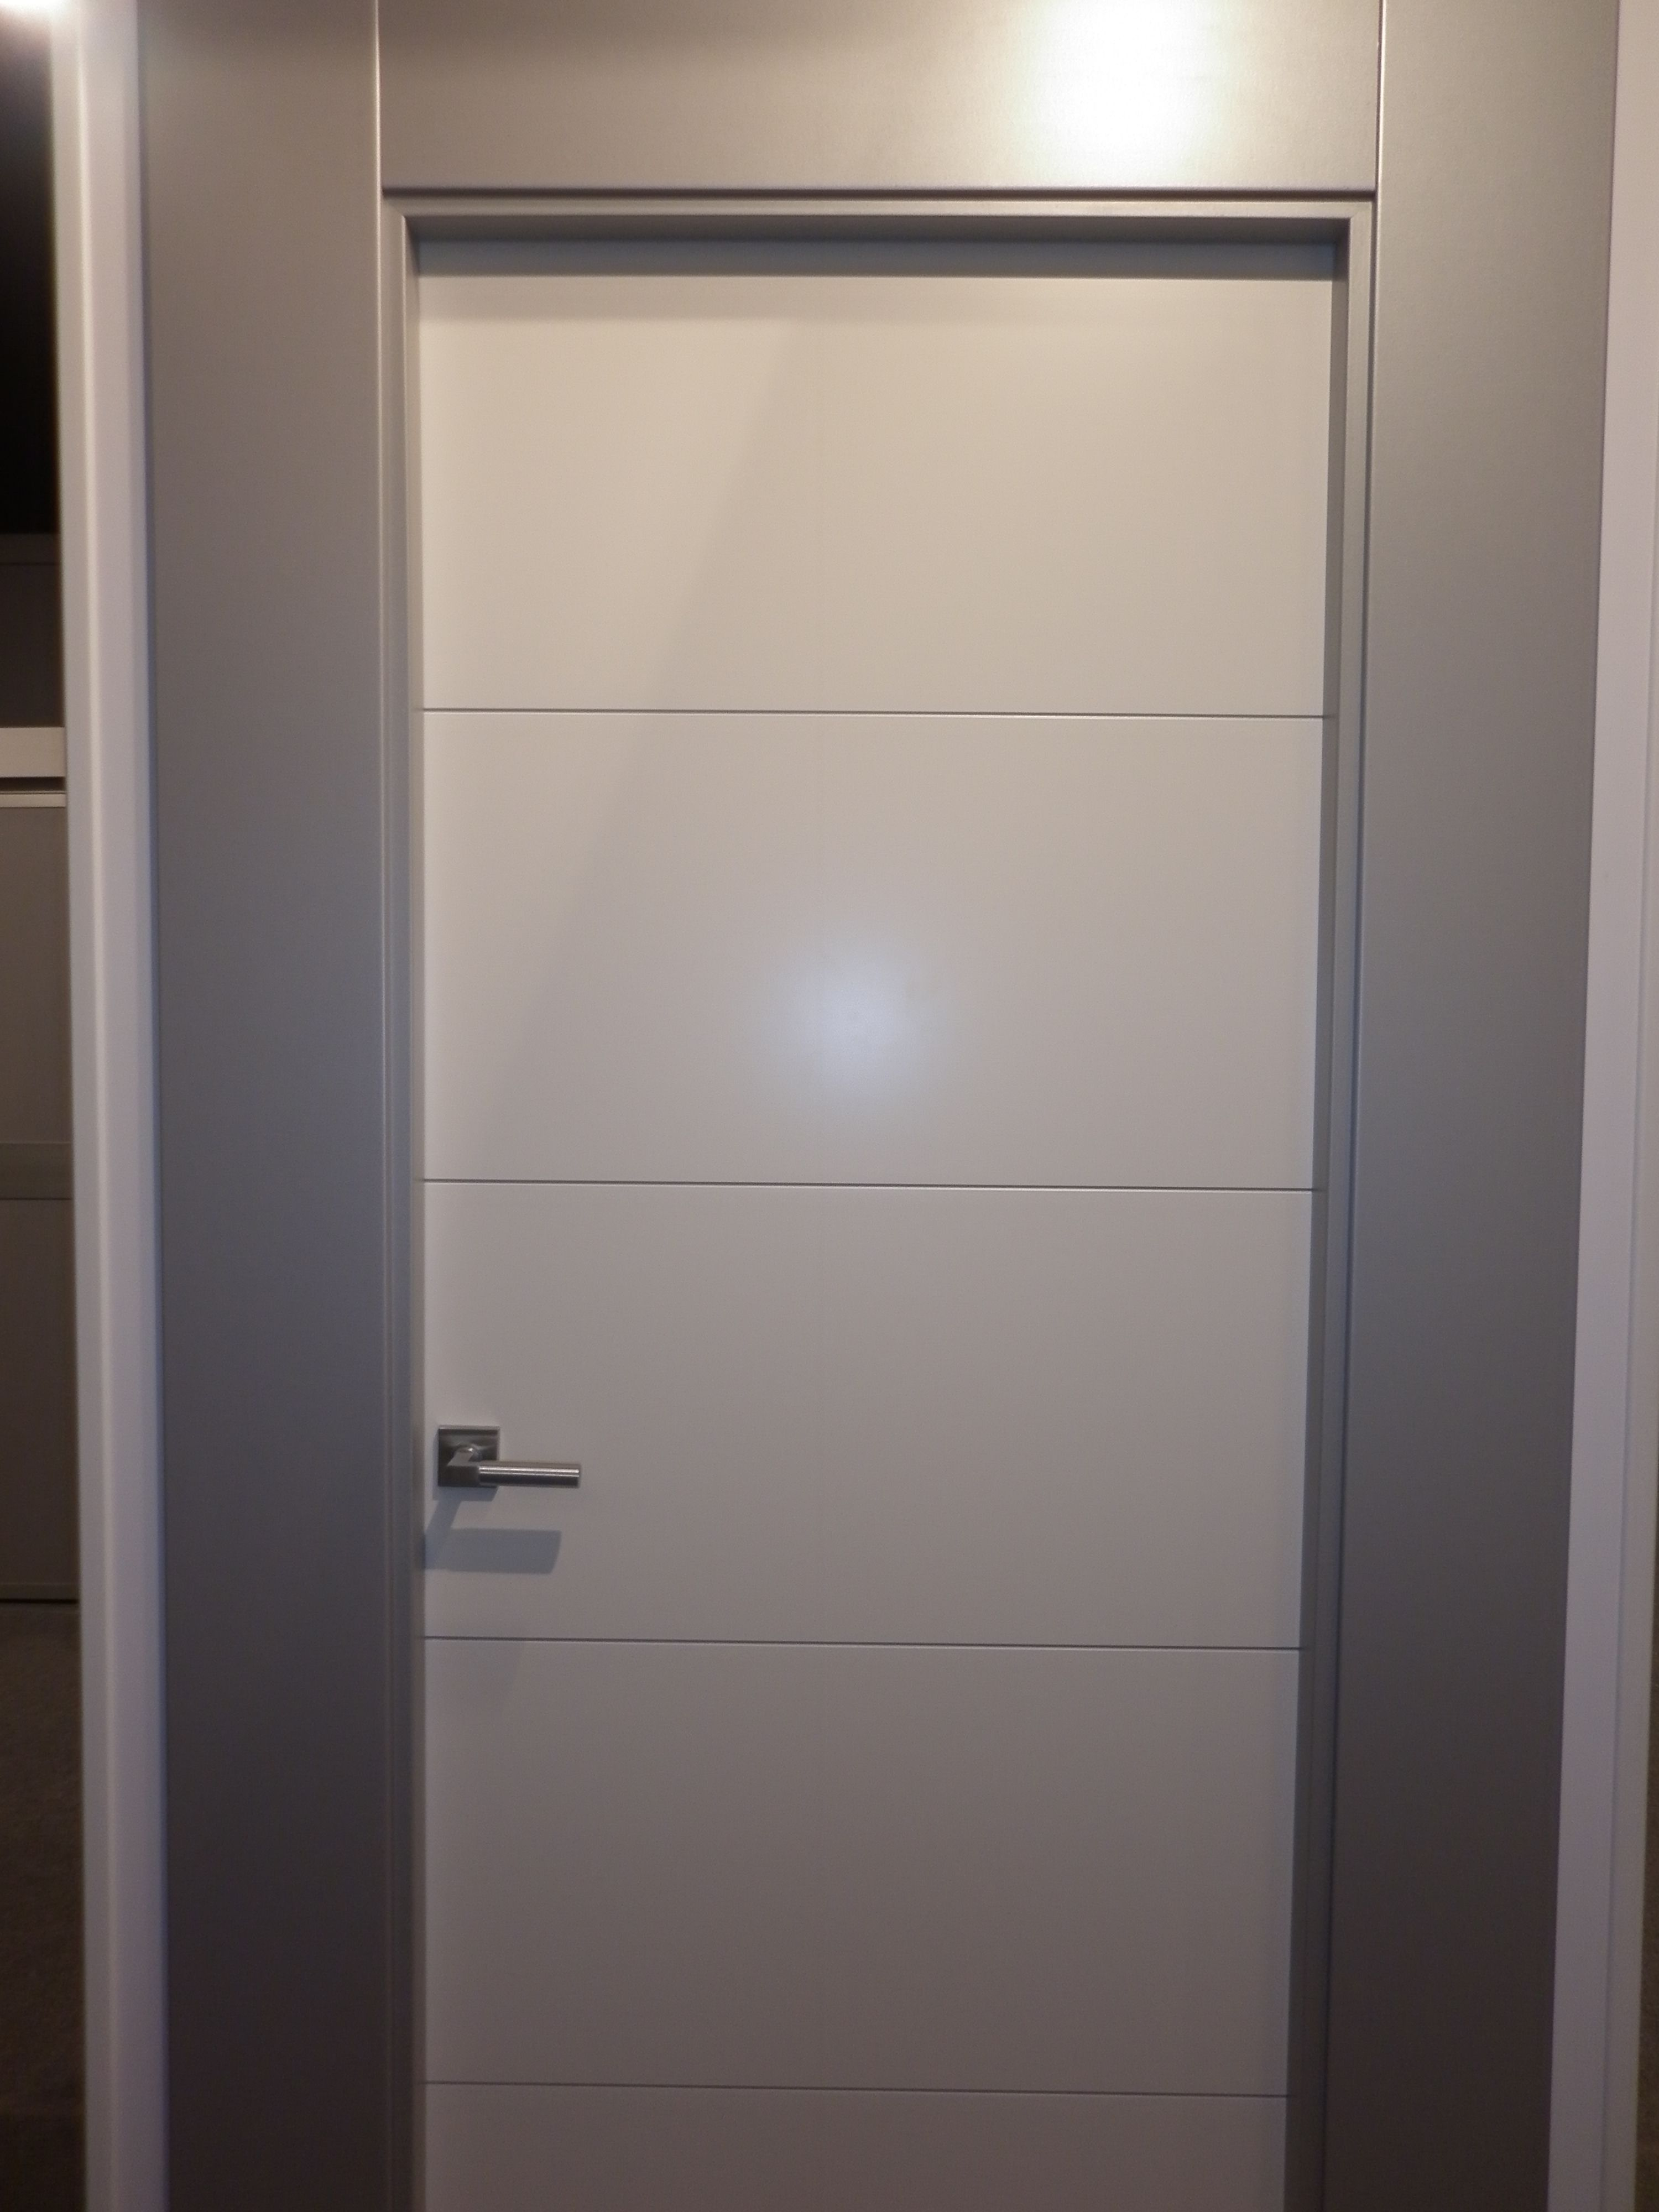 Oferta puertas interior free with oferta puertas interior for Puertas precios interior